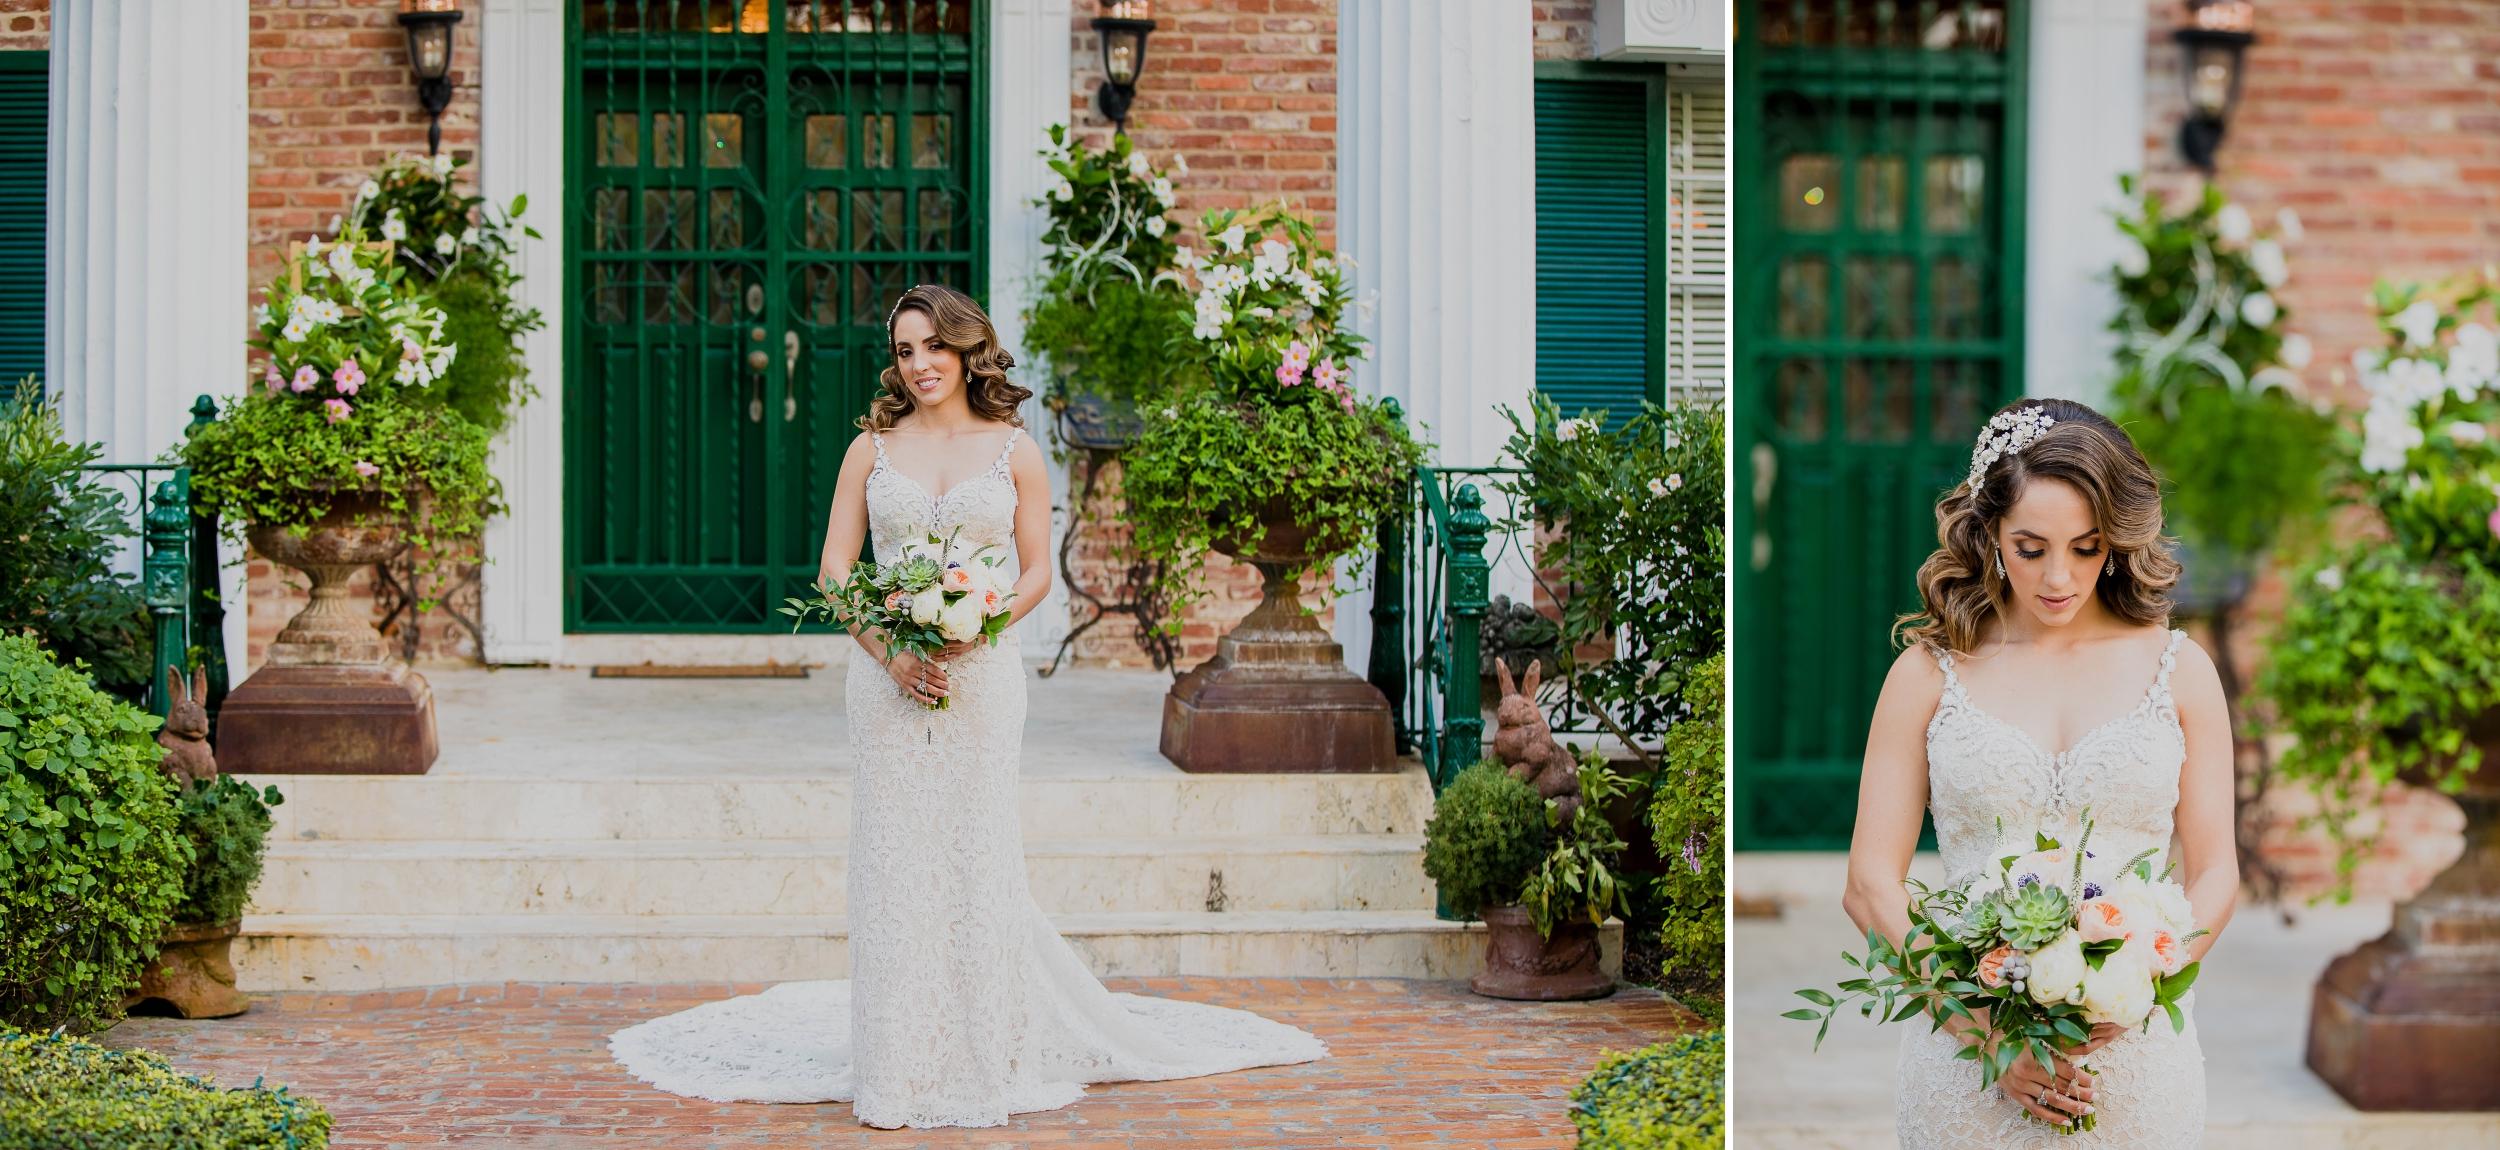 Wedding Miller Plantation Photography by Santy Martinez 5.jpg